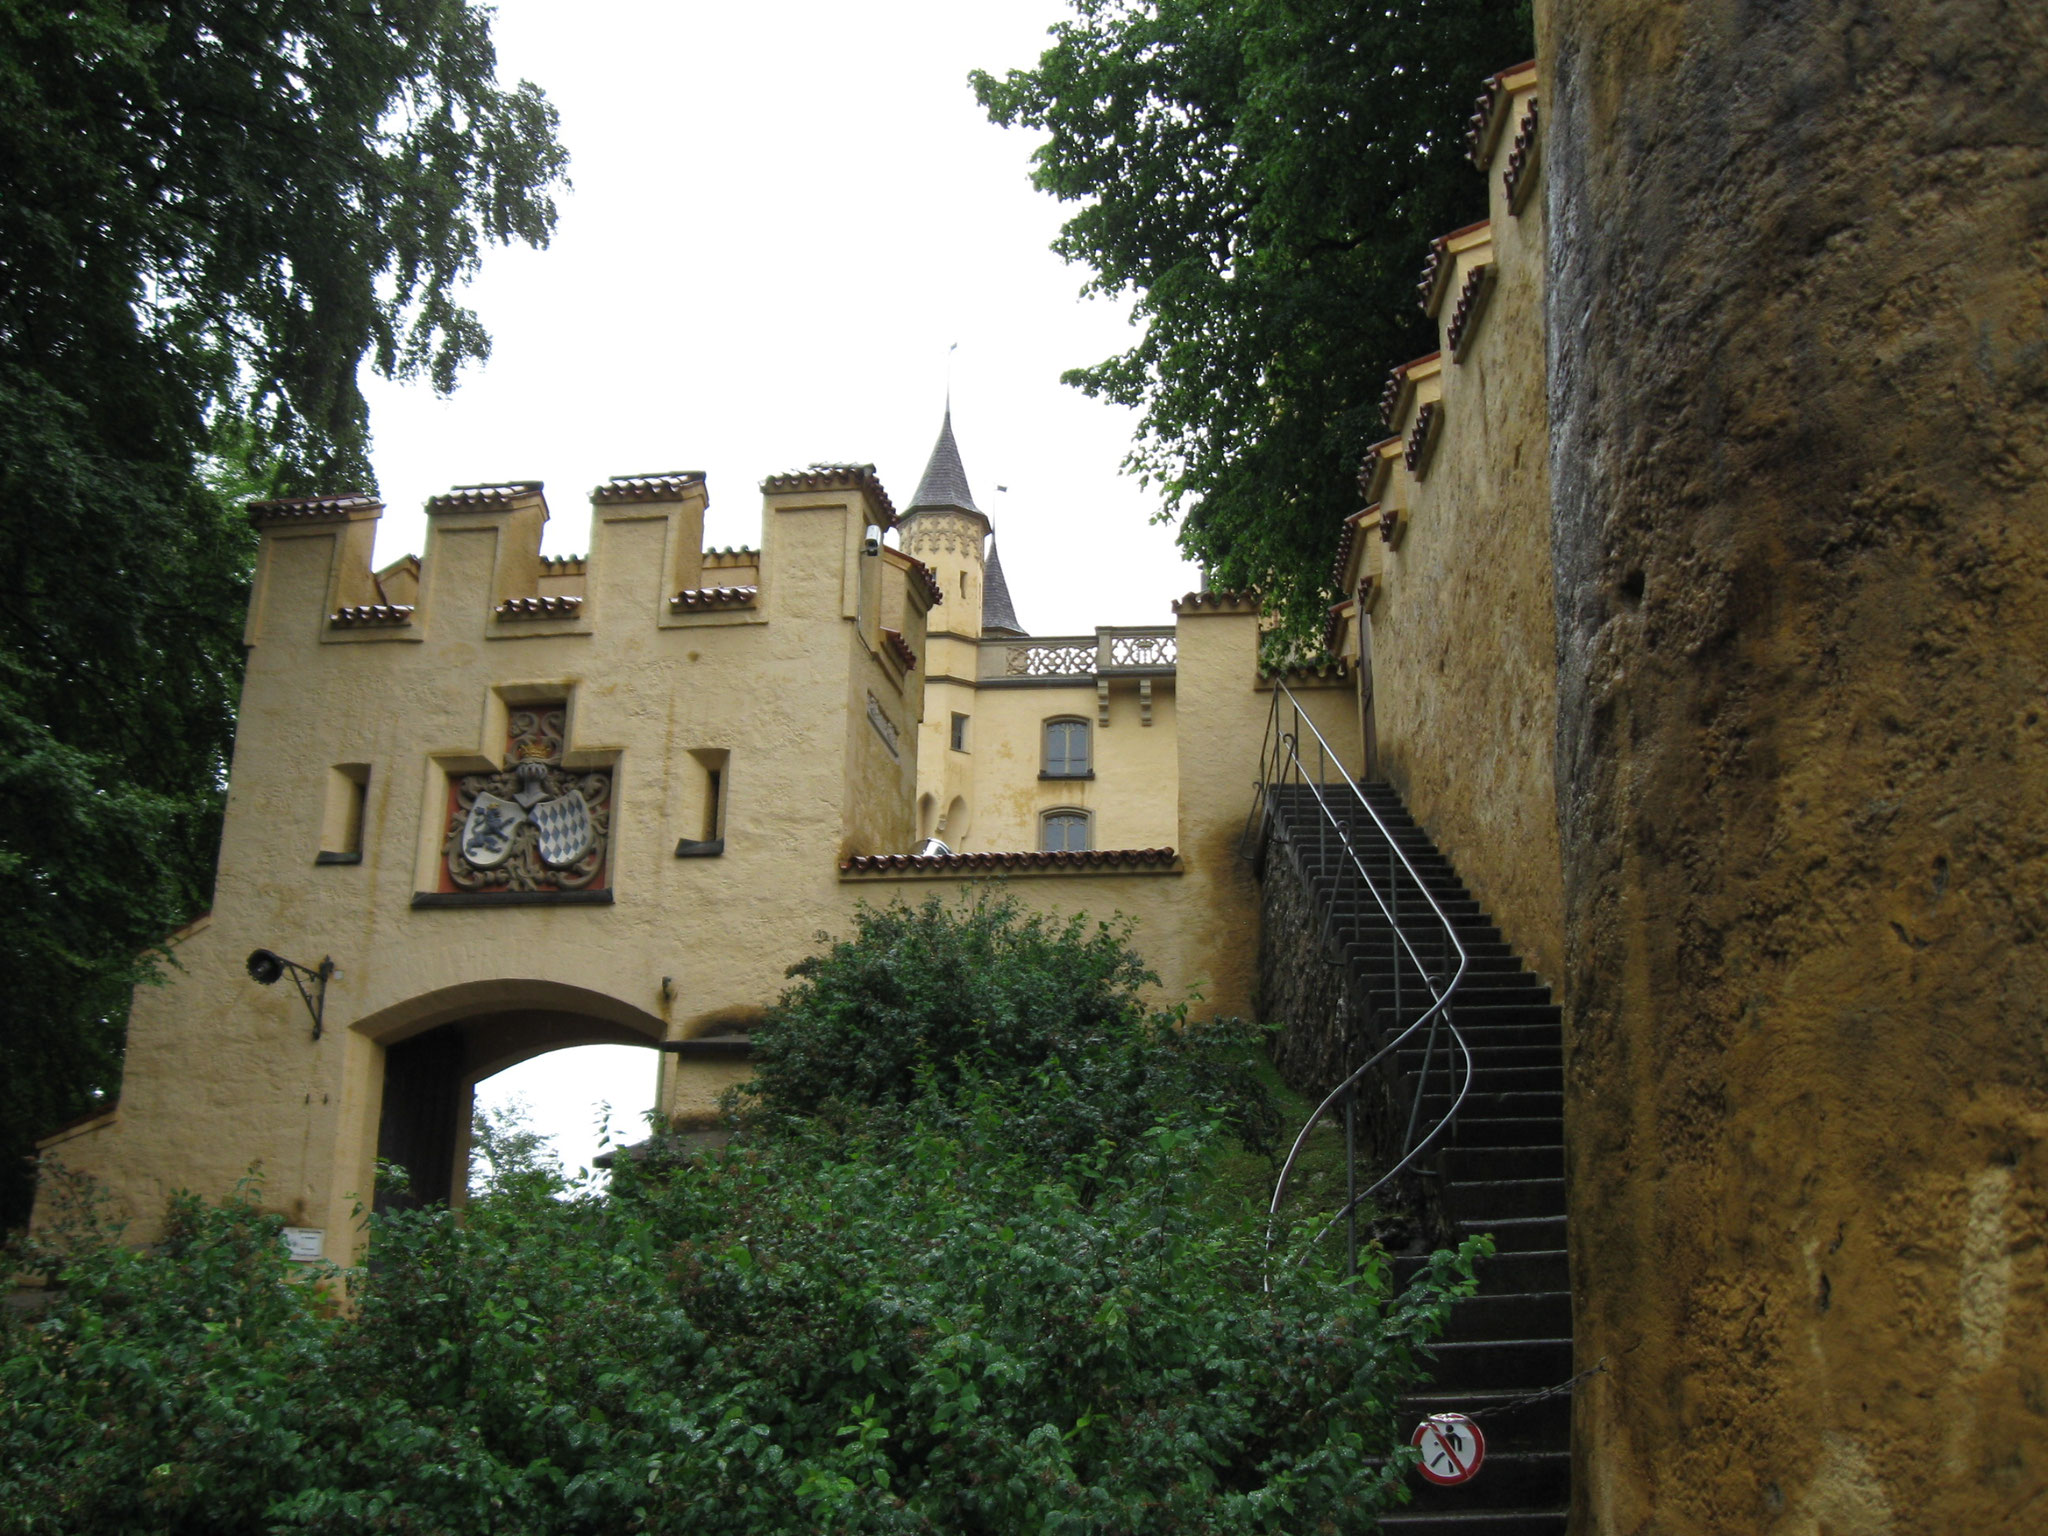 Eingang auf Hohenschwangau